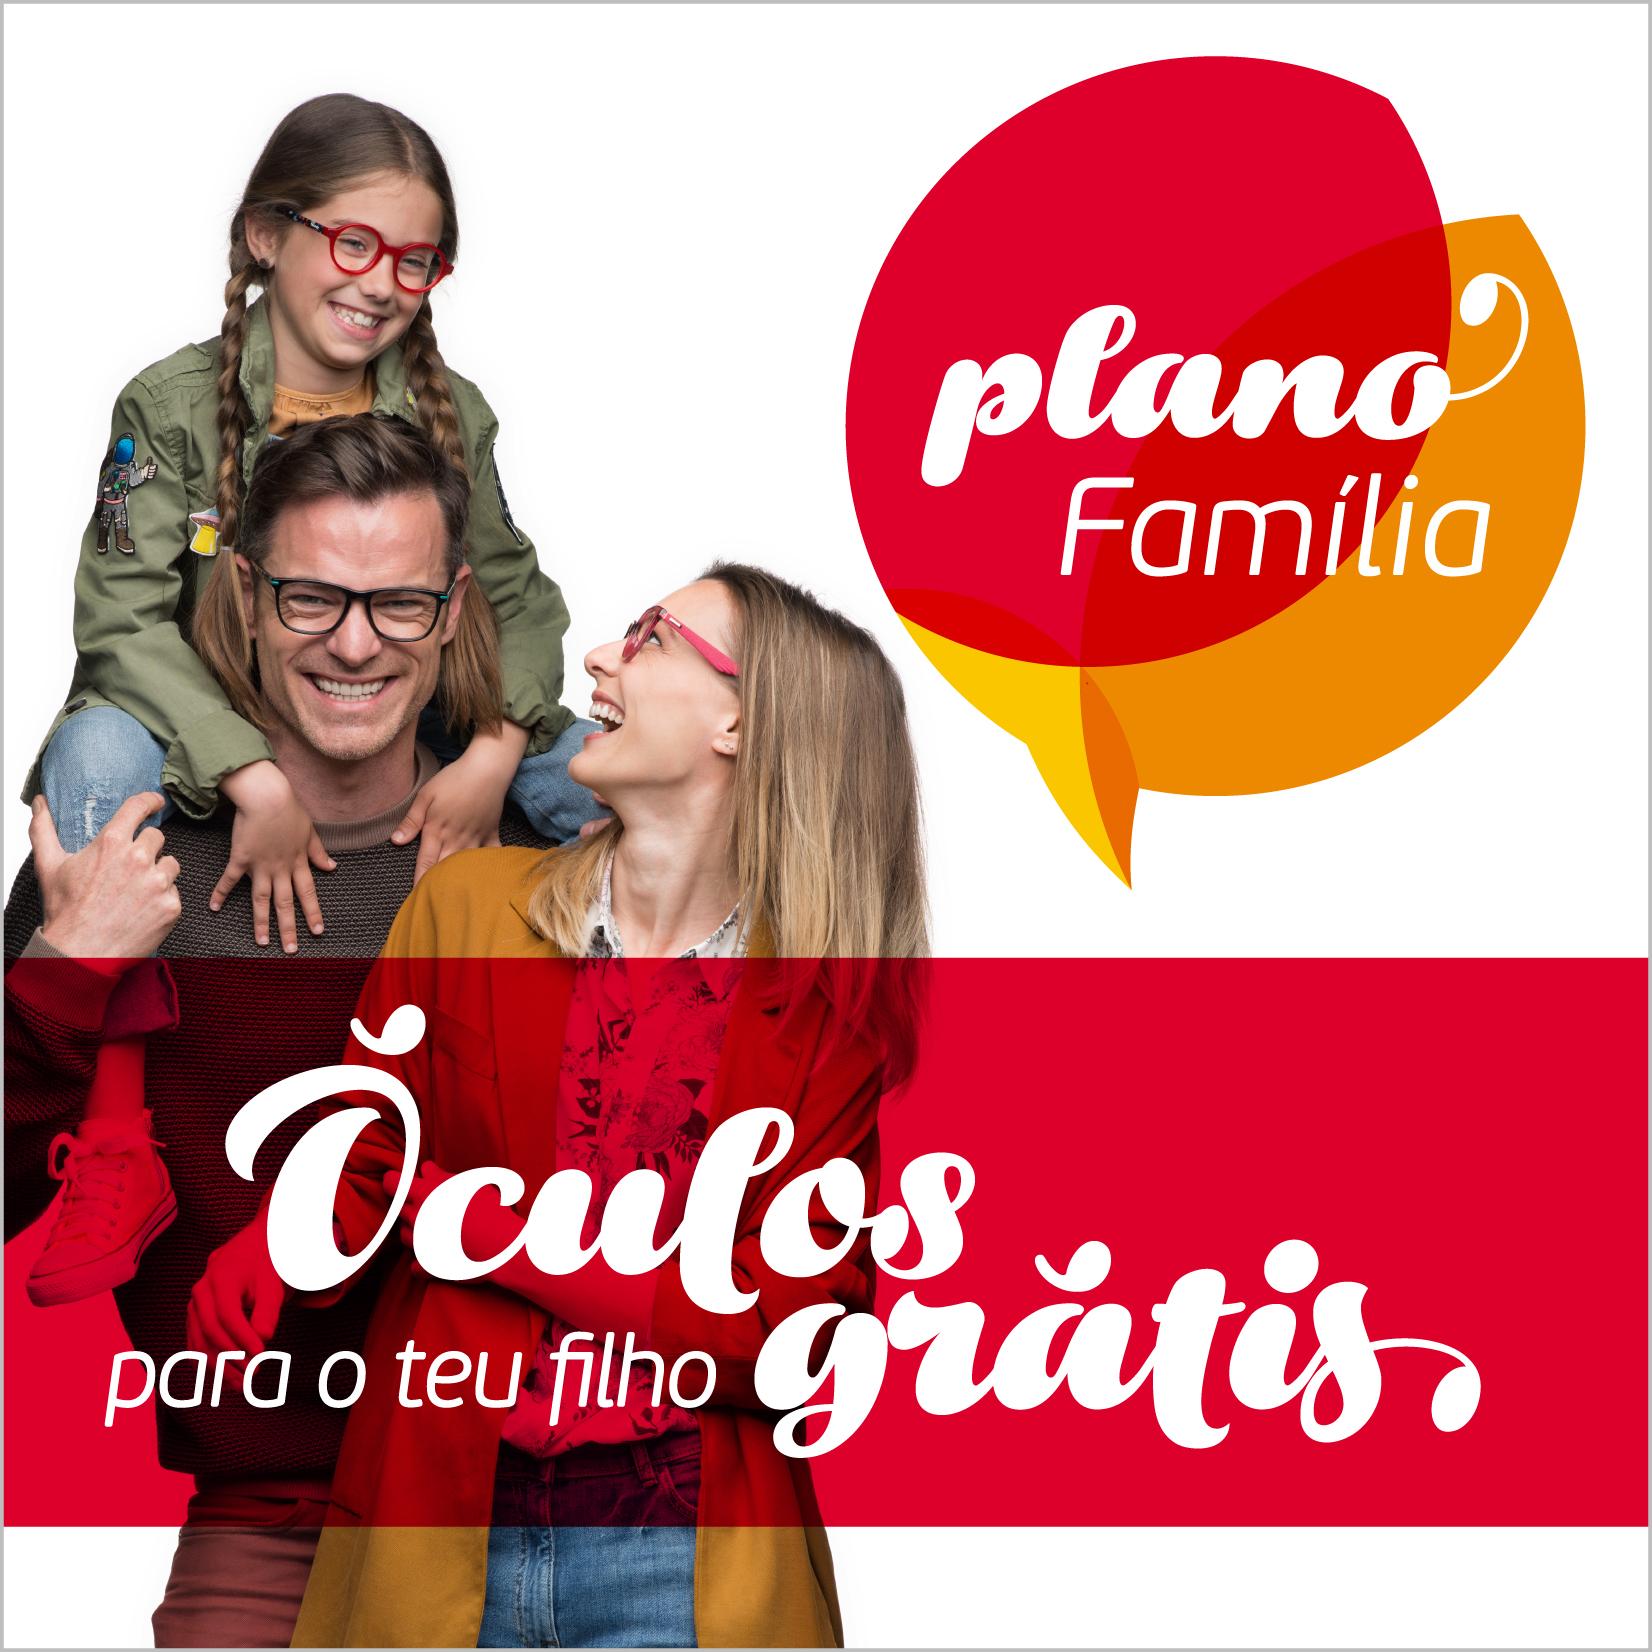 Plan renove familia